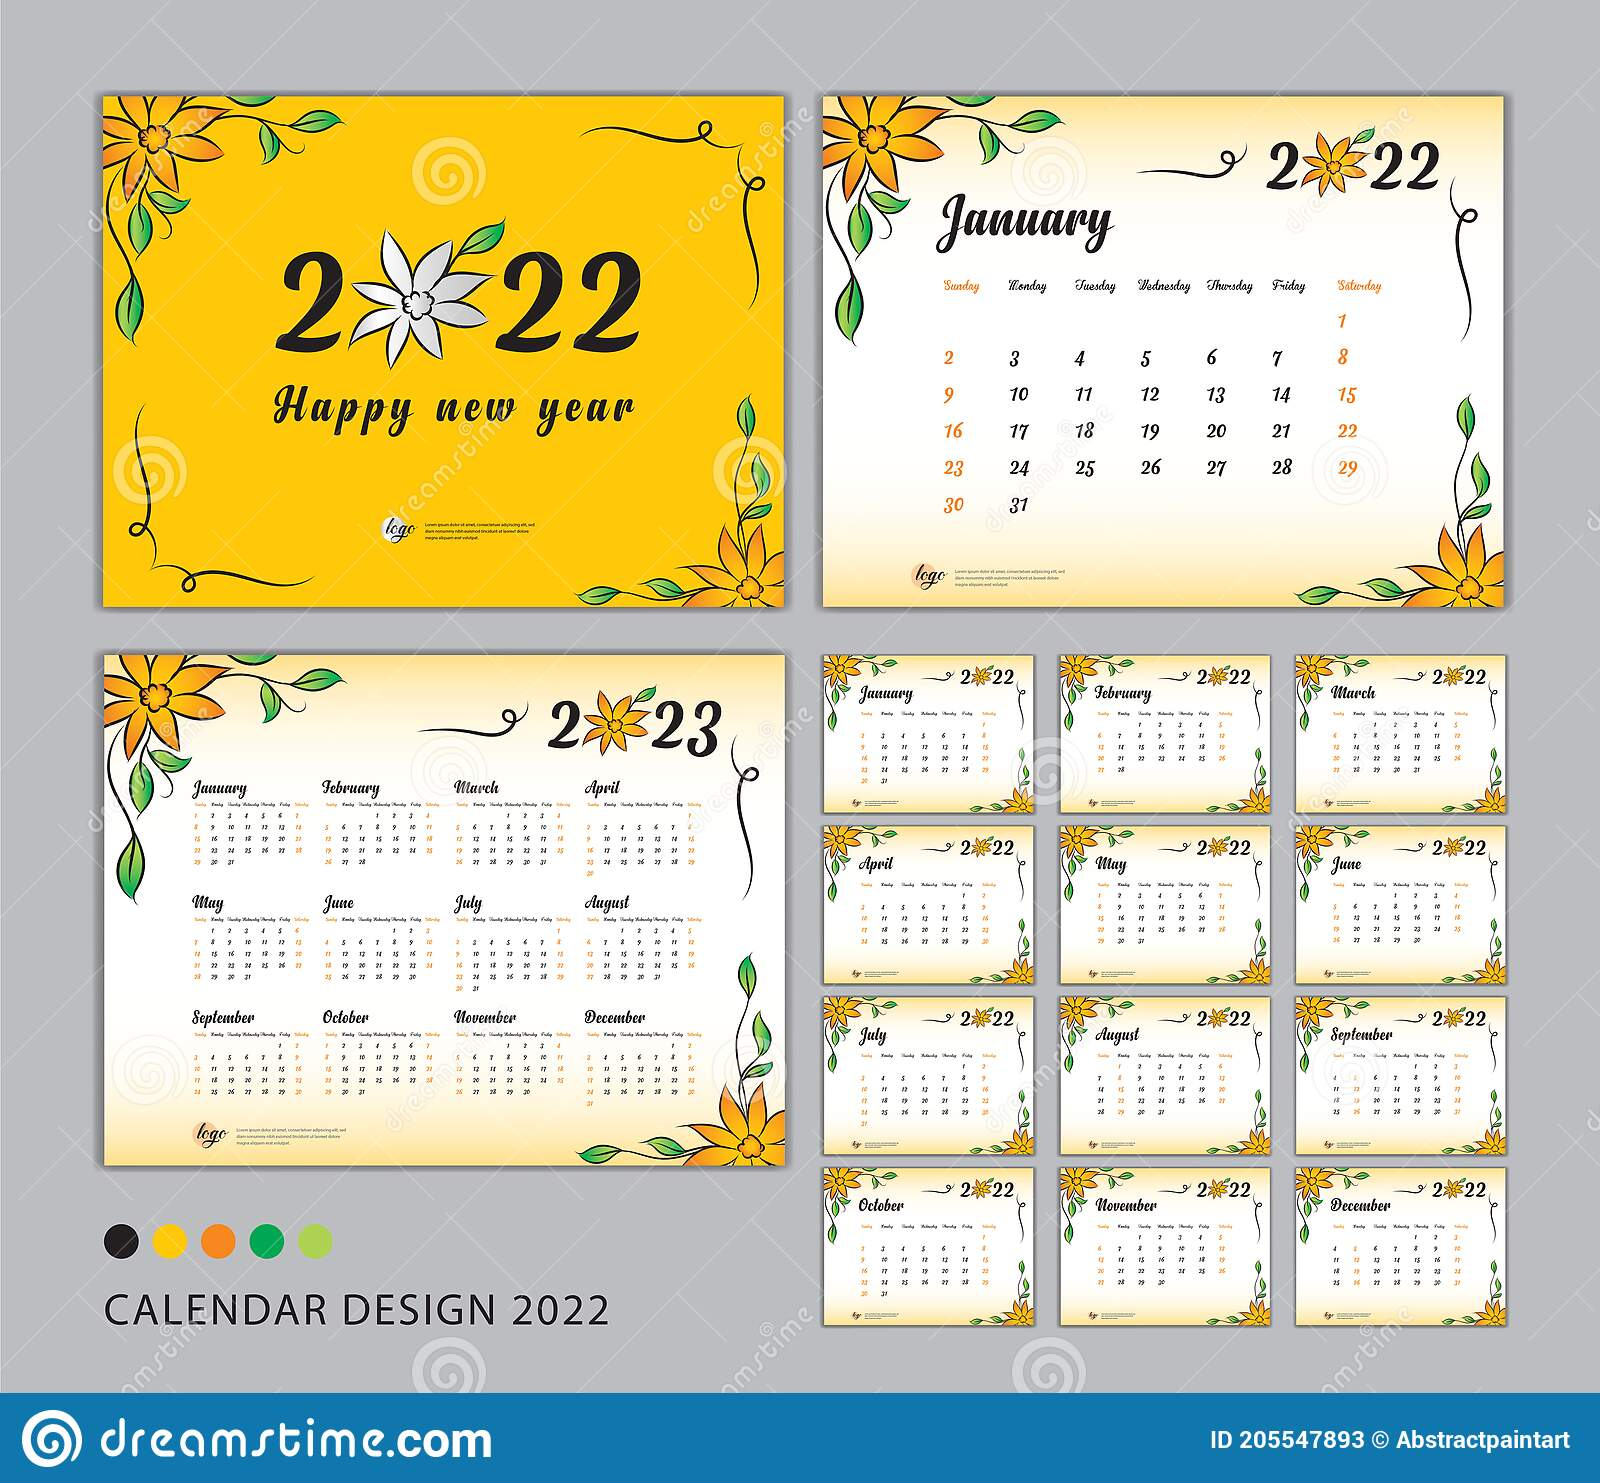 Desk Calendar 2022 Template Set Flower Concept Calendar 2022 2023 Happy New Year 2022 Year Wall Calendar 2022 Design Stock Vector Illustration Of Business Flower 205547893